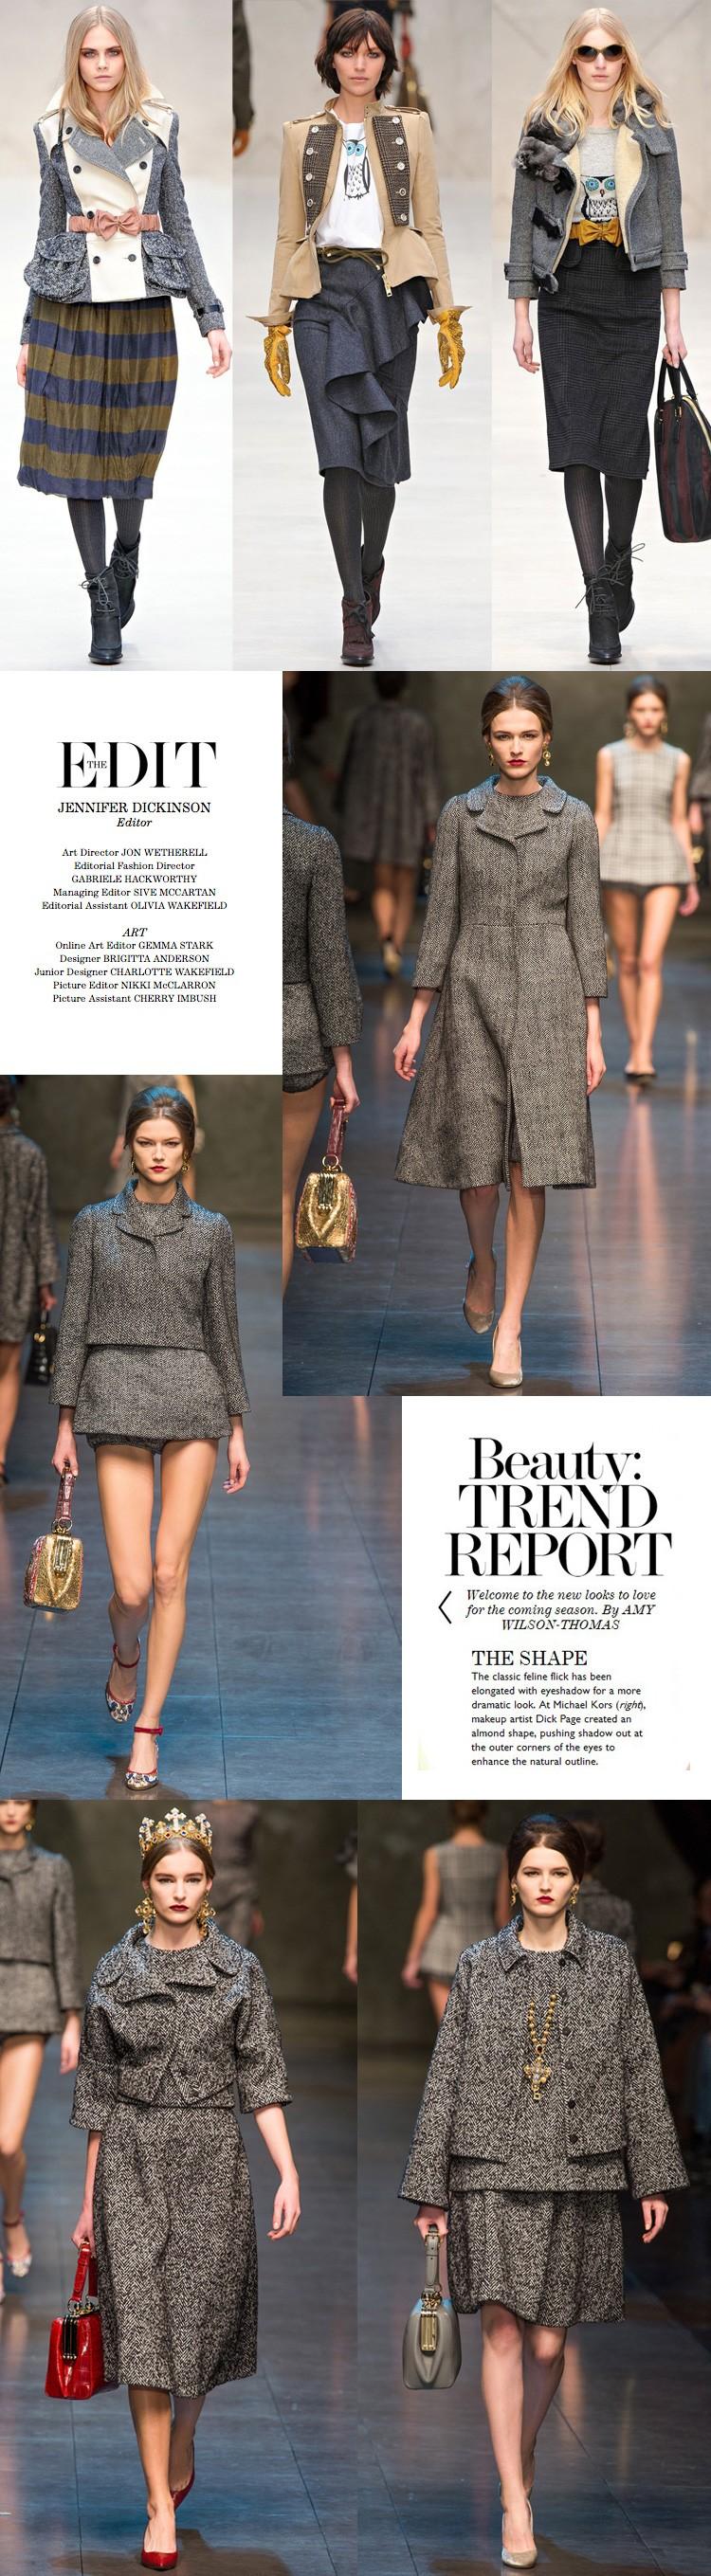 ④Limitada 7 colores Venta caliente espiga moda finos lana viscosa ...